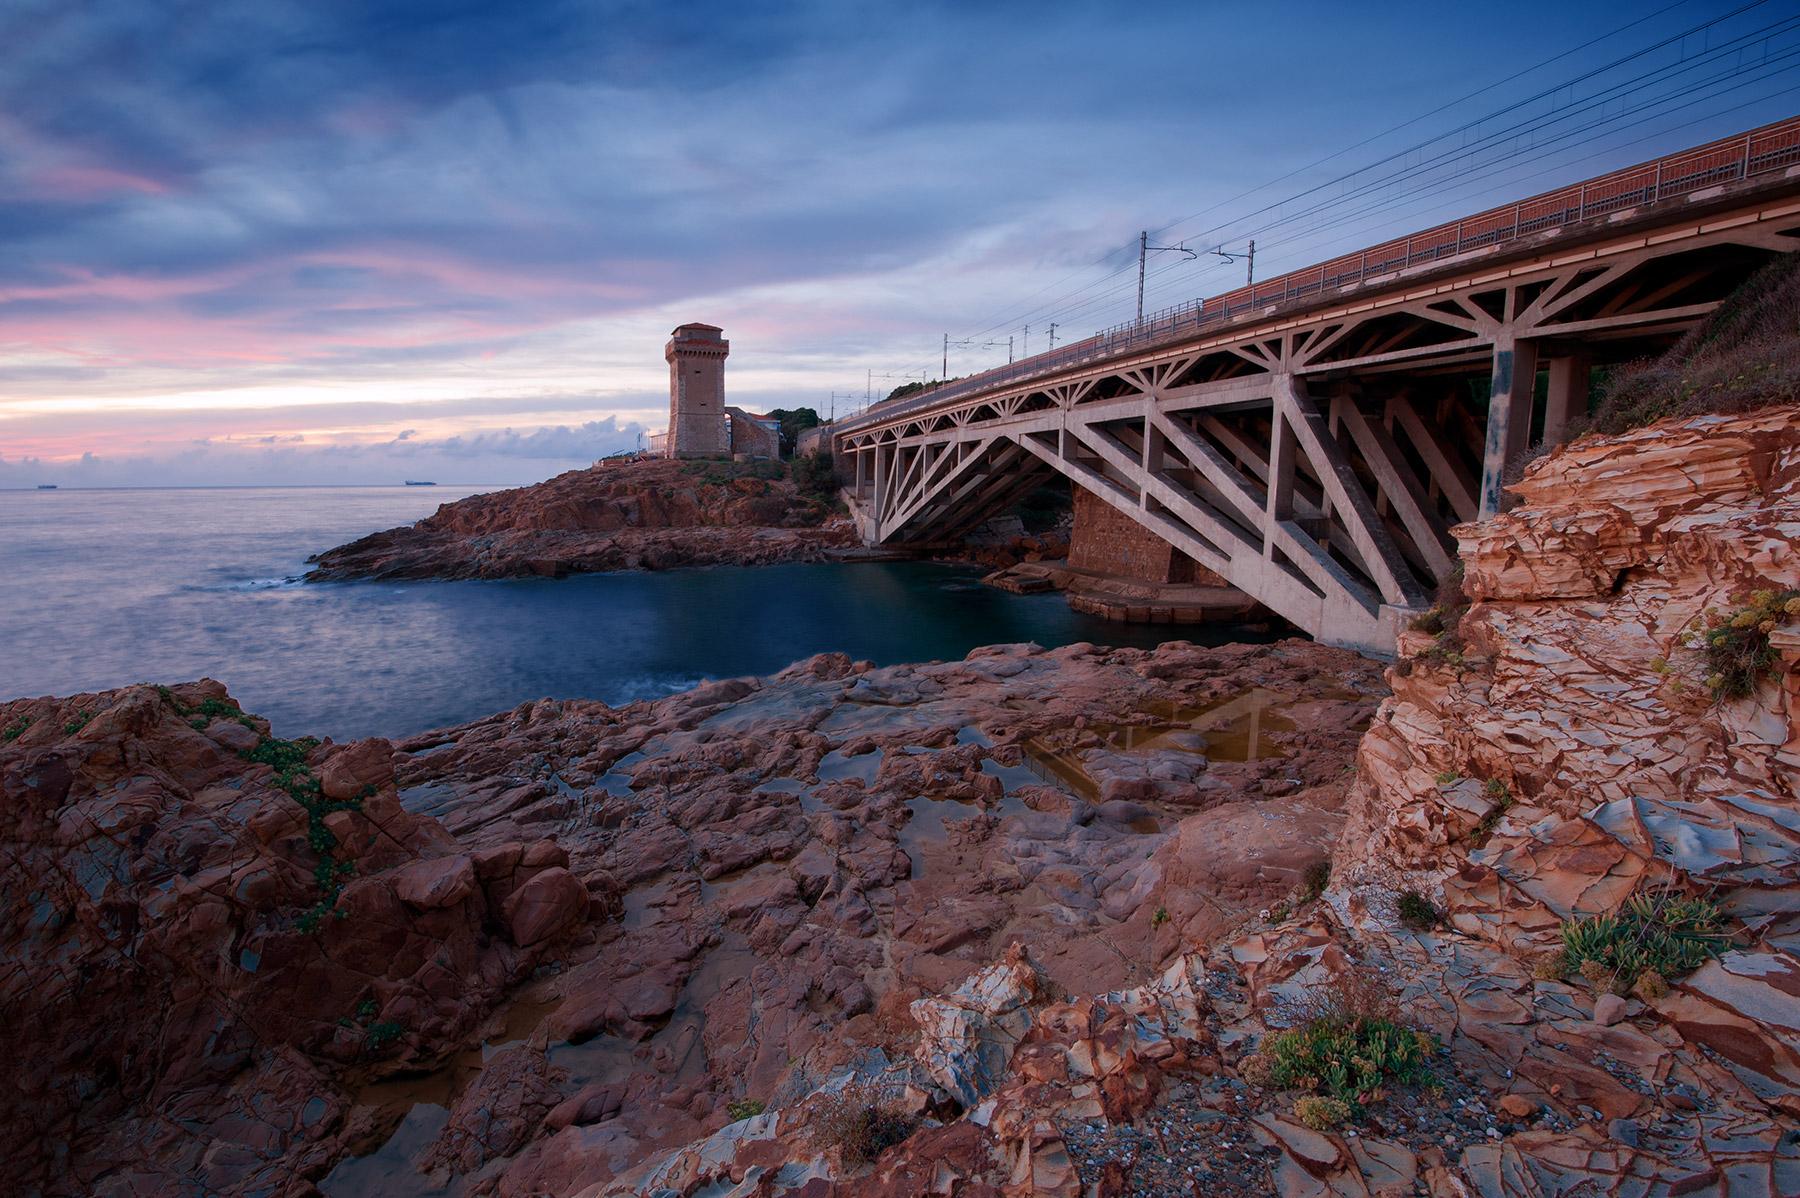 Torre e Ponte di Calafuria...